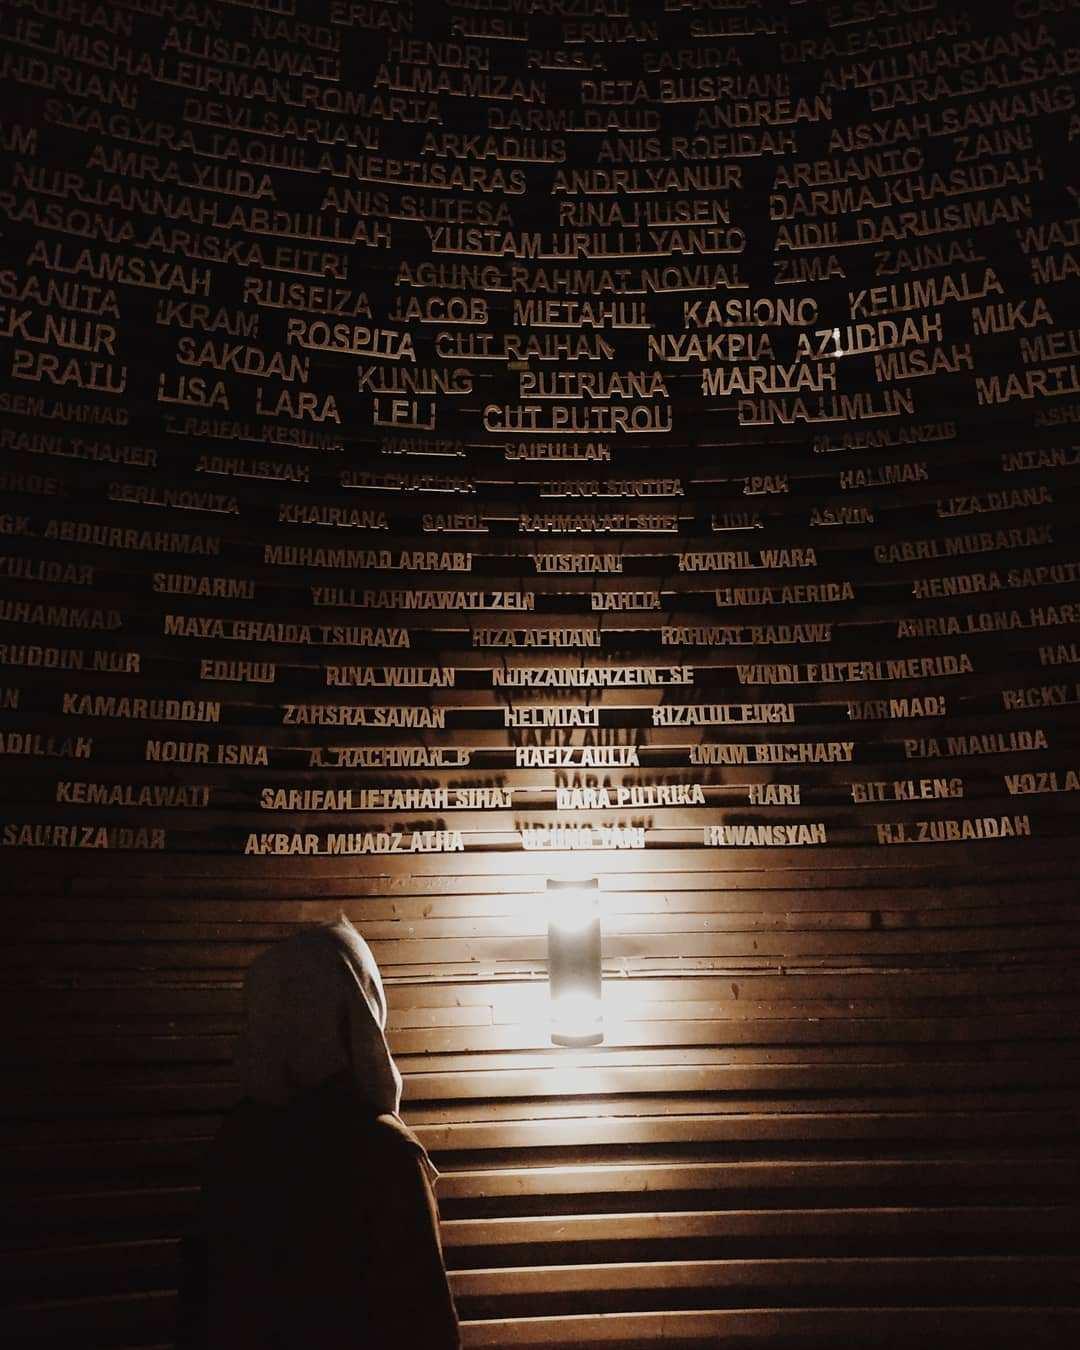 Ruang Cahaya Tuhan di Museum Tsunami Aceh Image From @yunnirahmma